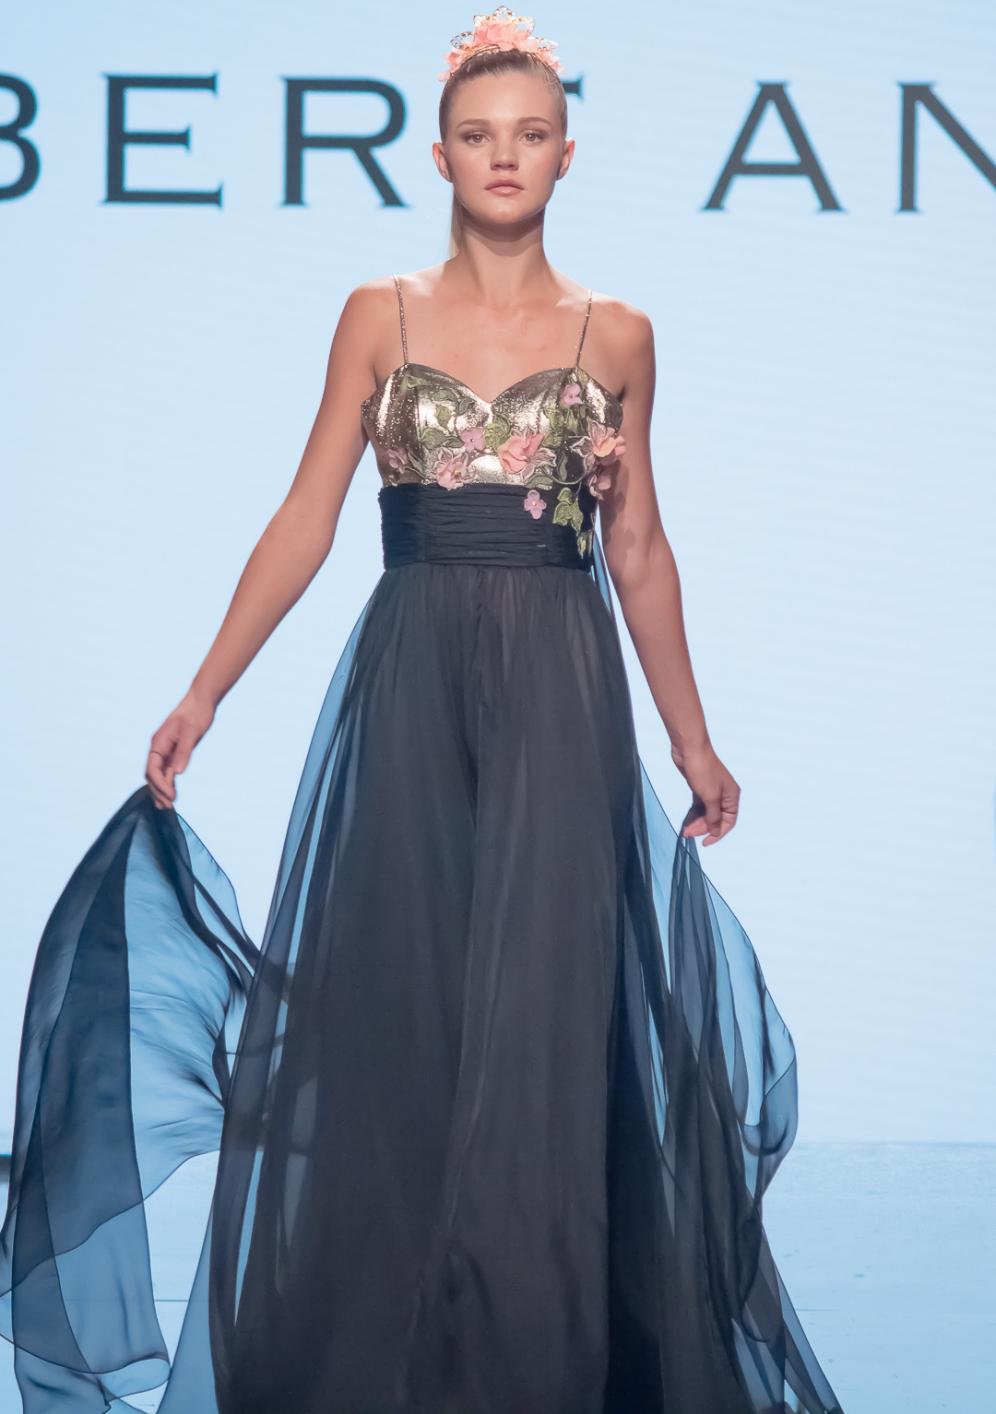 adonis-king-lian-showcase-art-hearts-fashion-4chion-lifestyle-12042